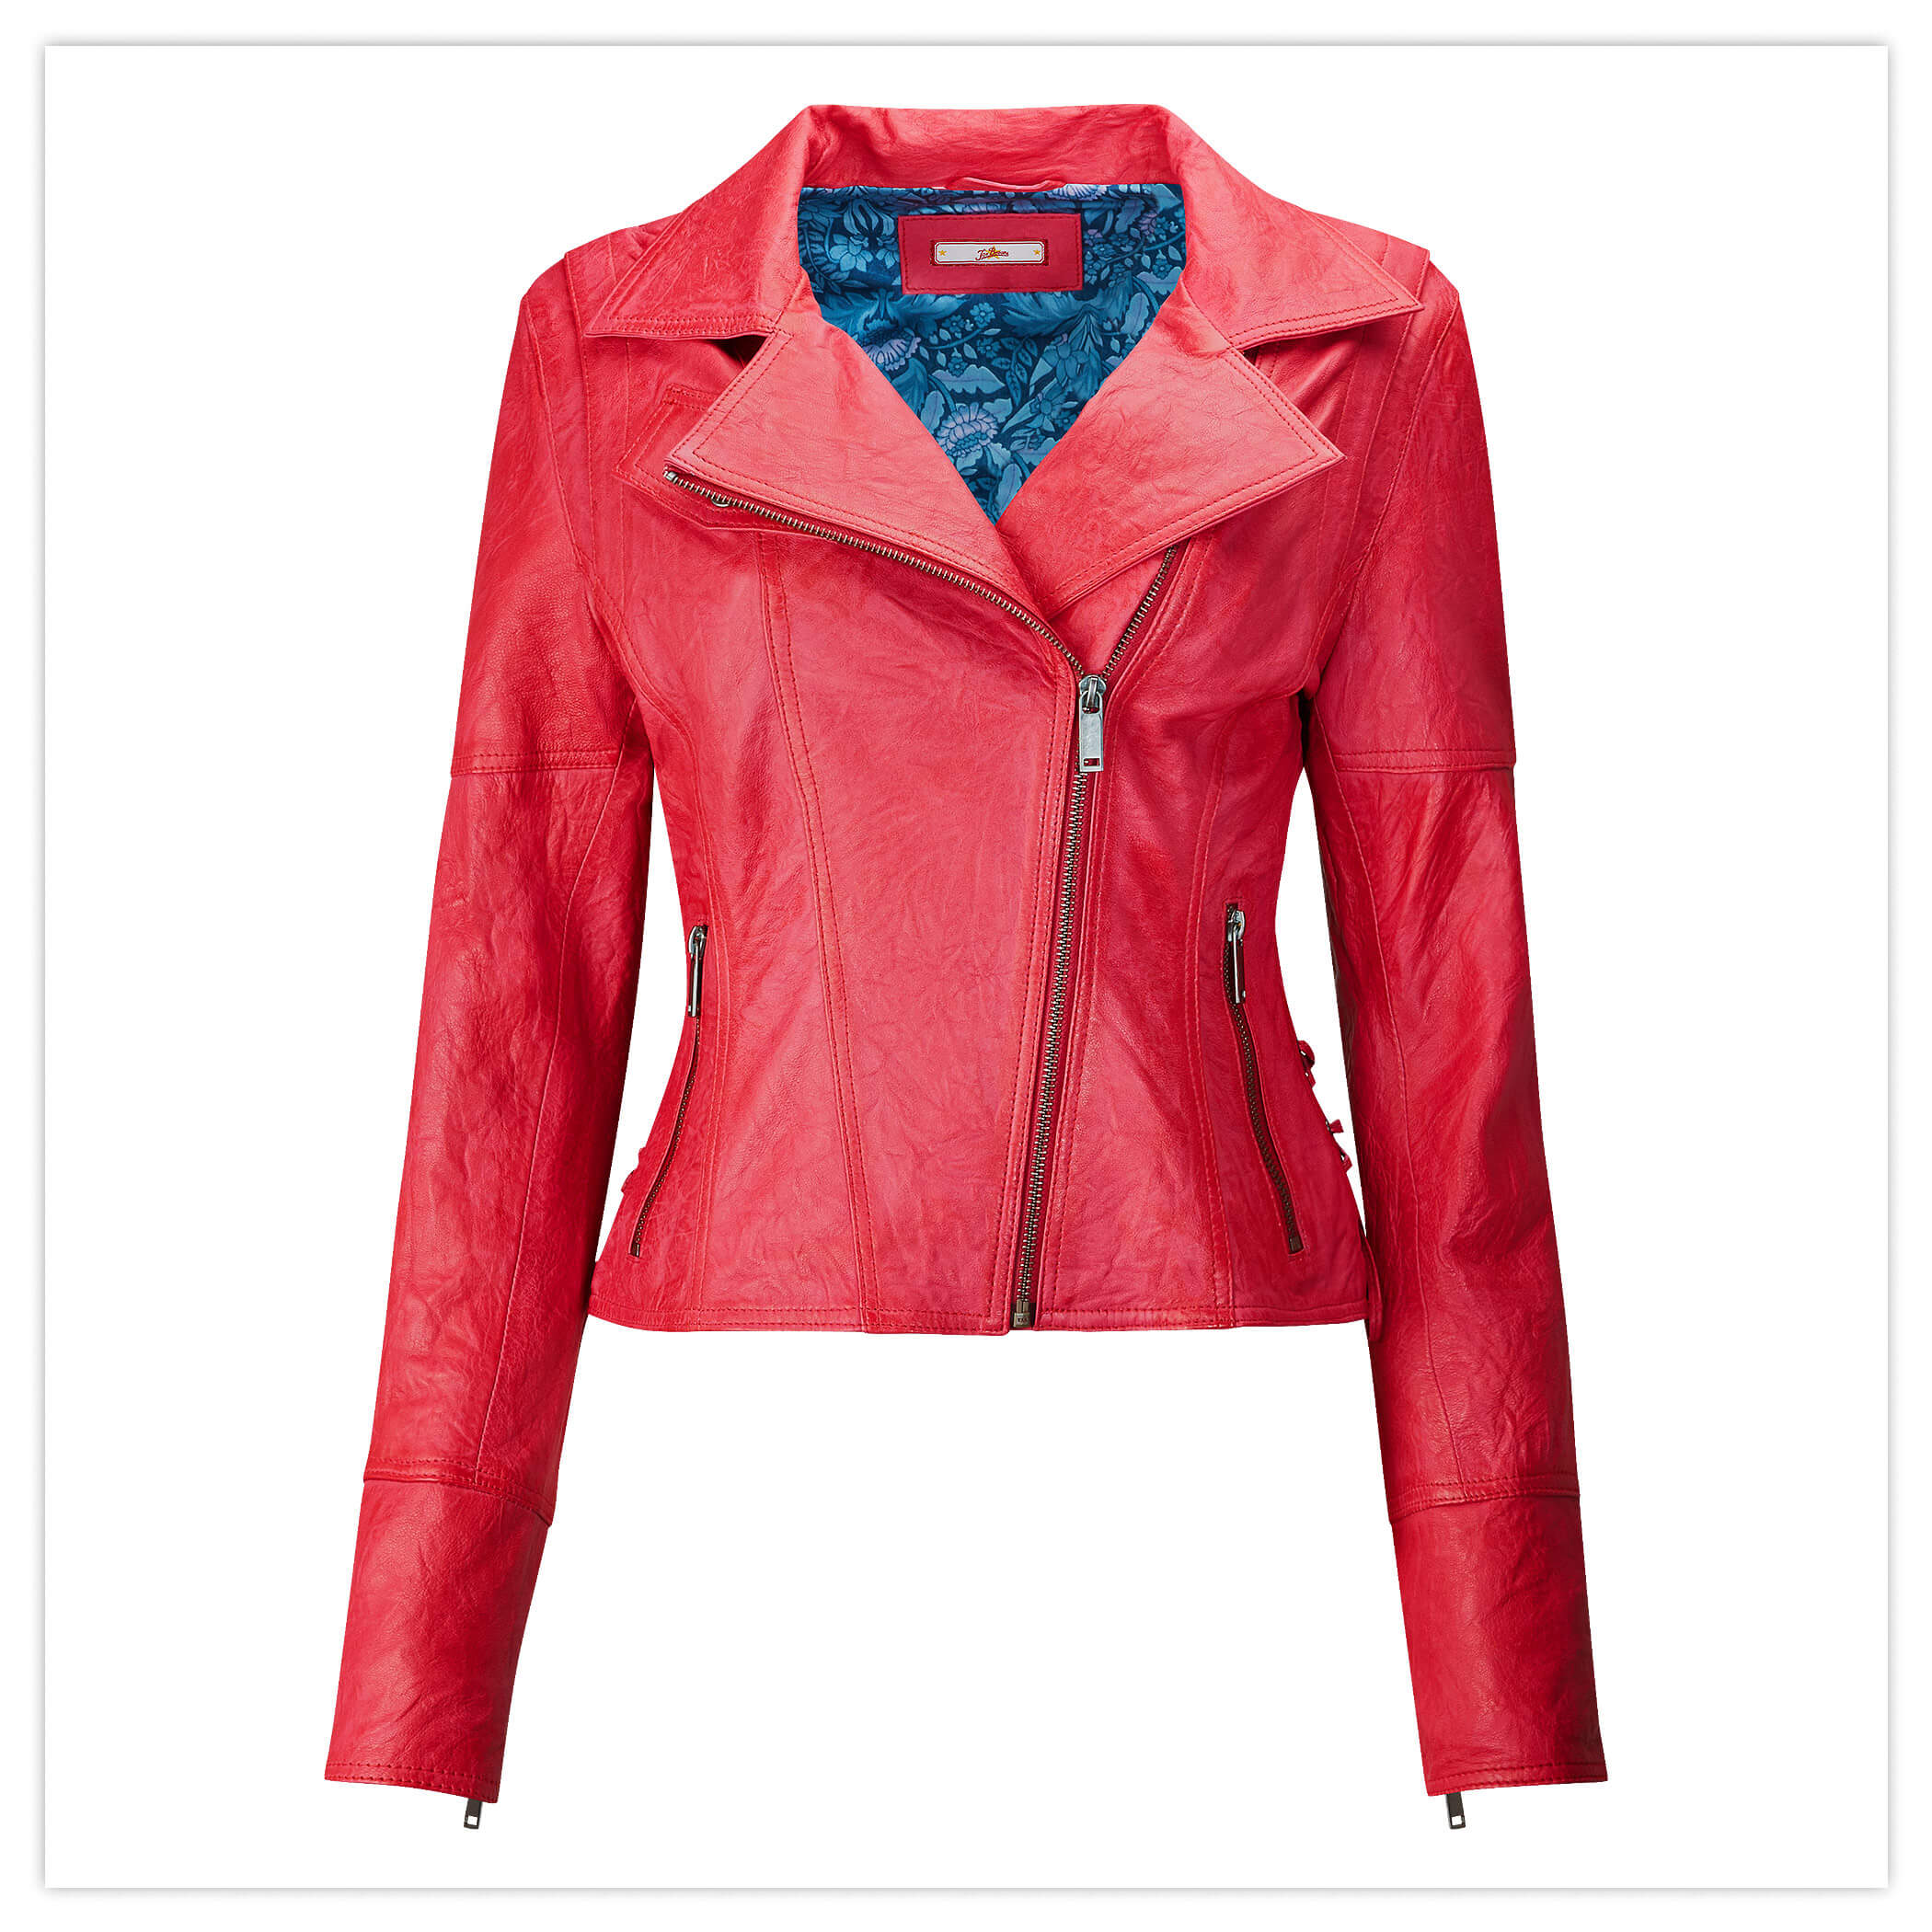 Joe's Funky Leather Jacket